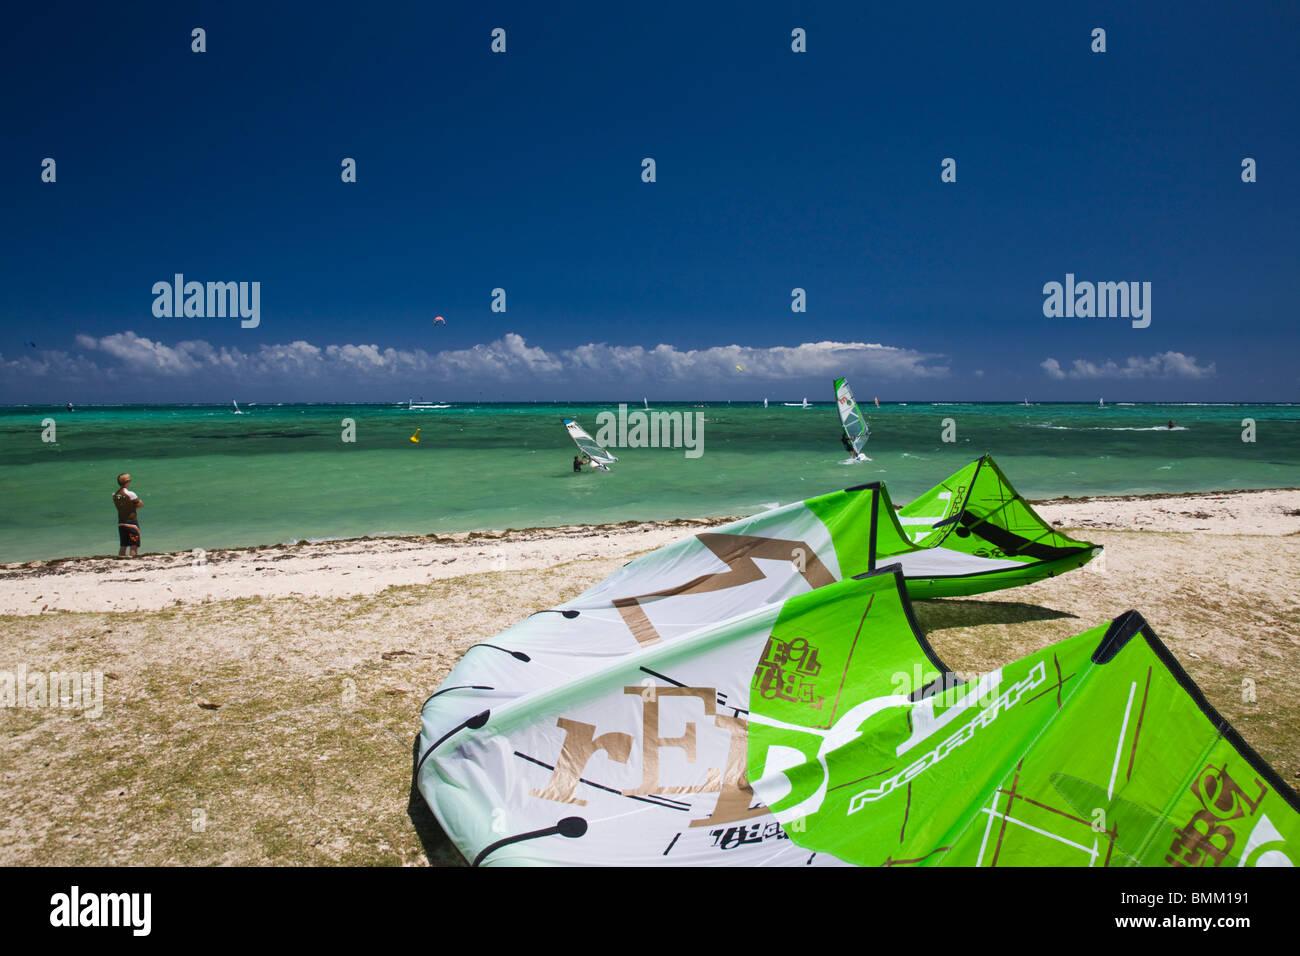 Le morne windsurfing